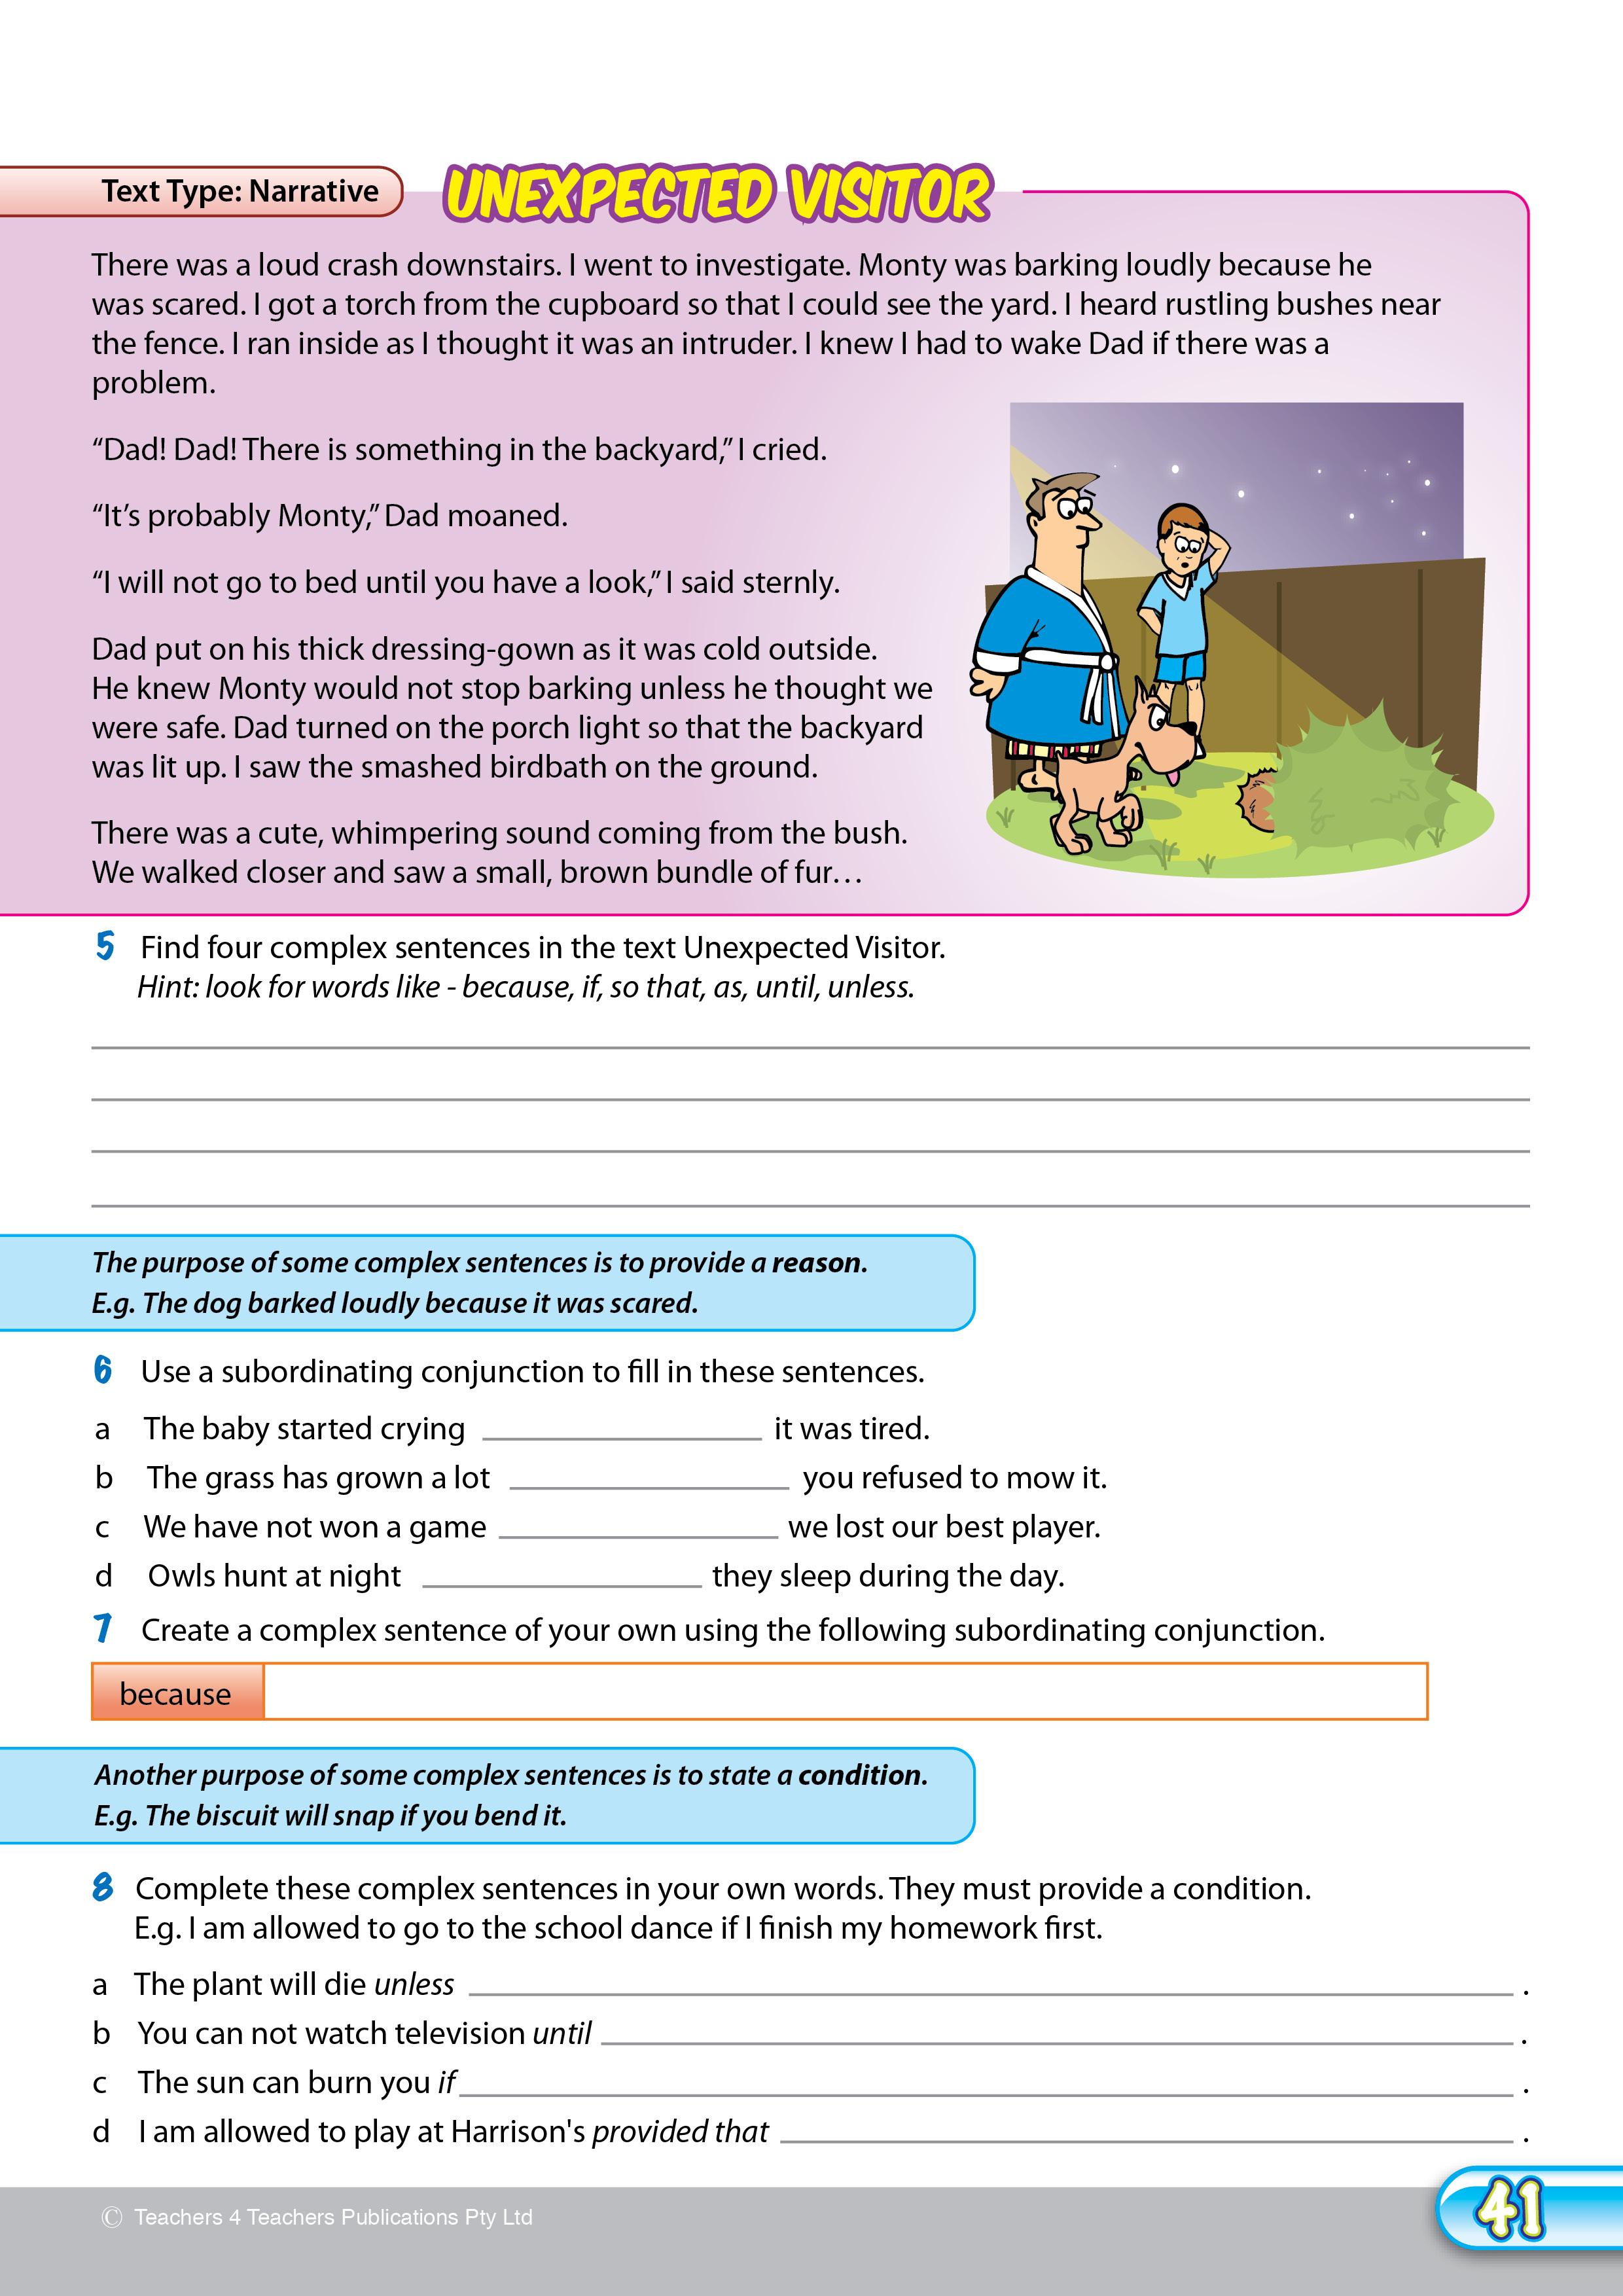 grammar conventions teachers 4 teachers publications pty ltd